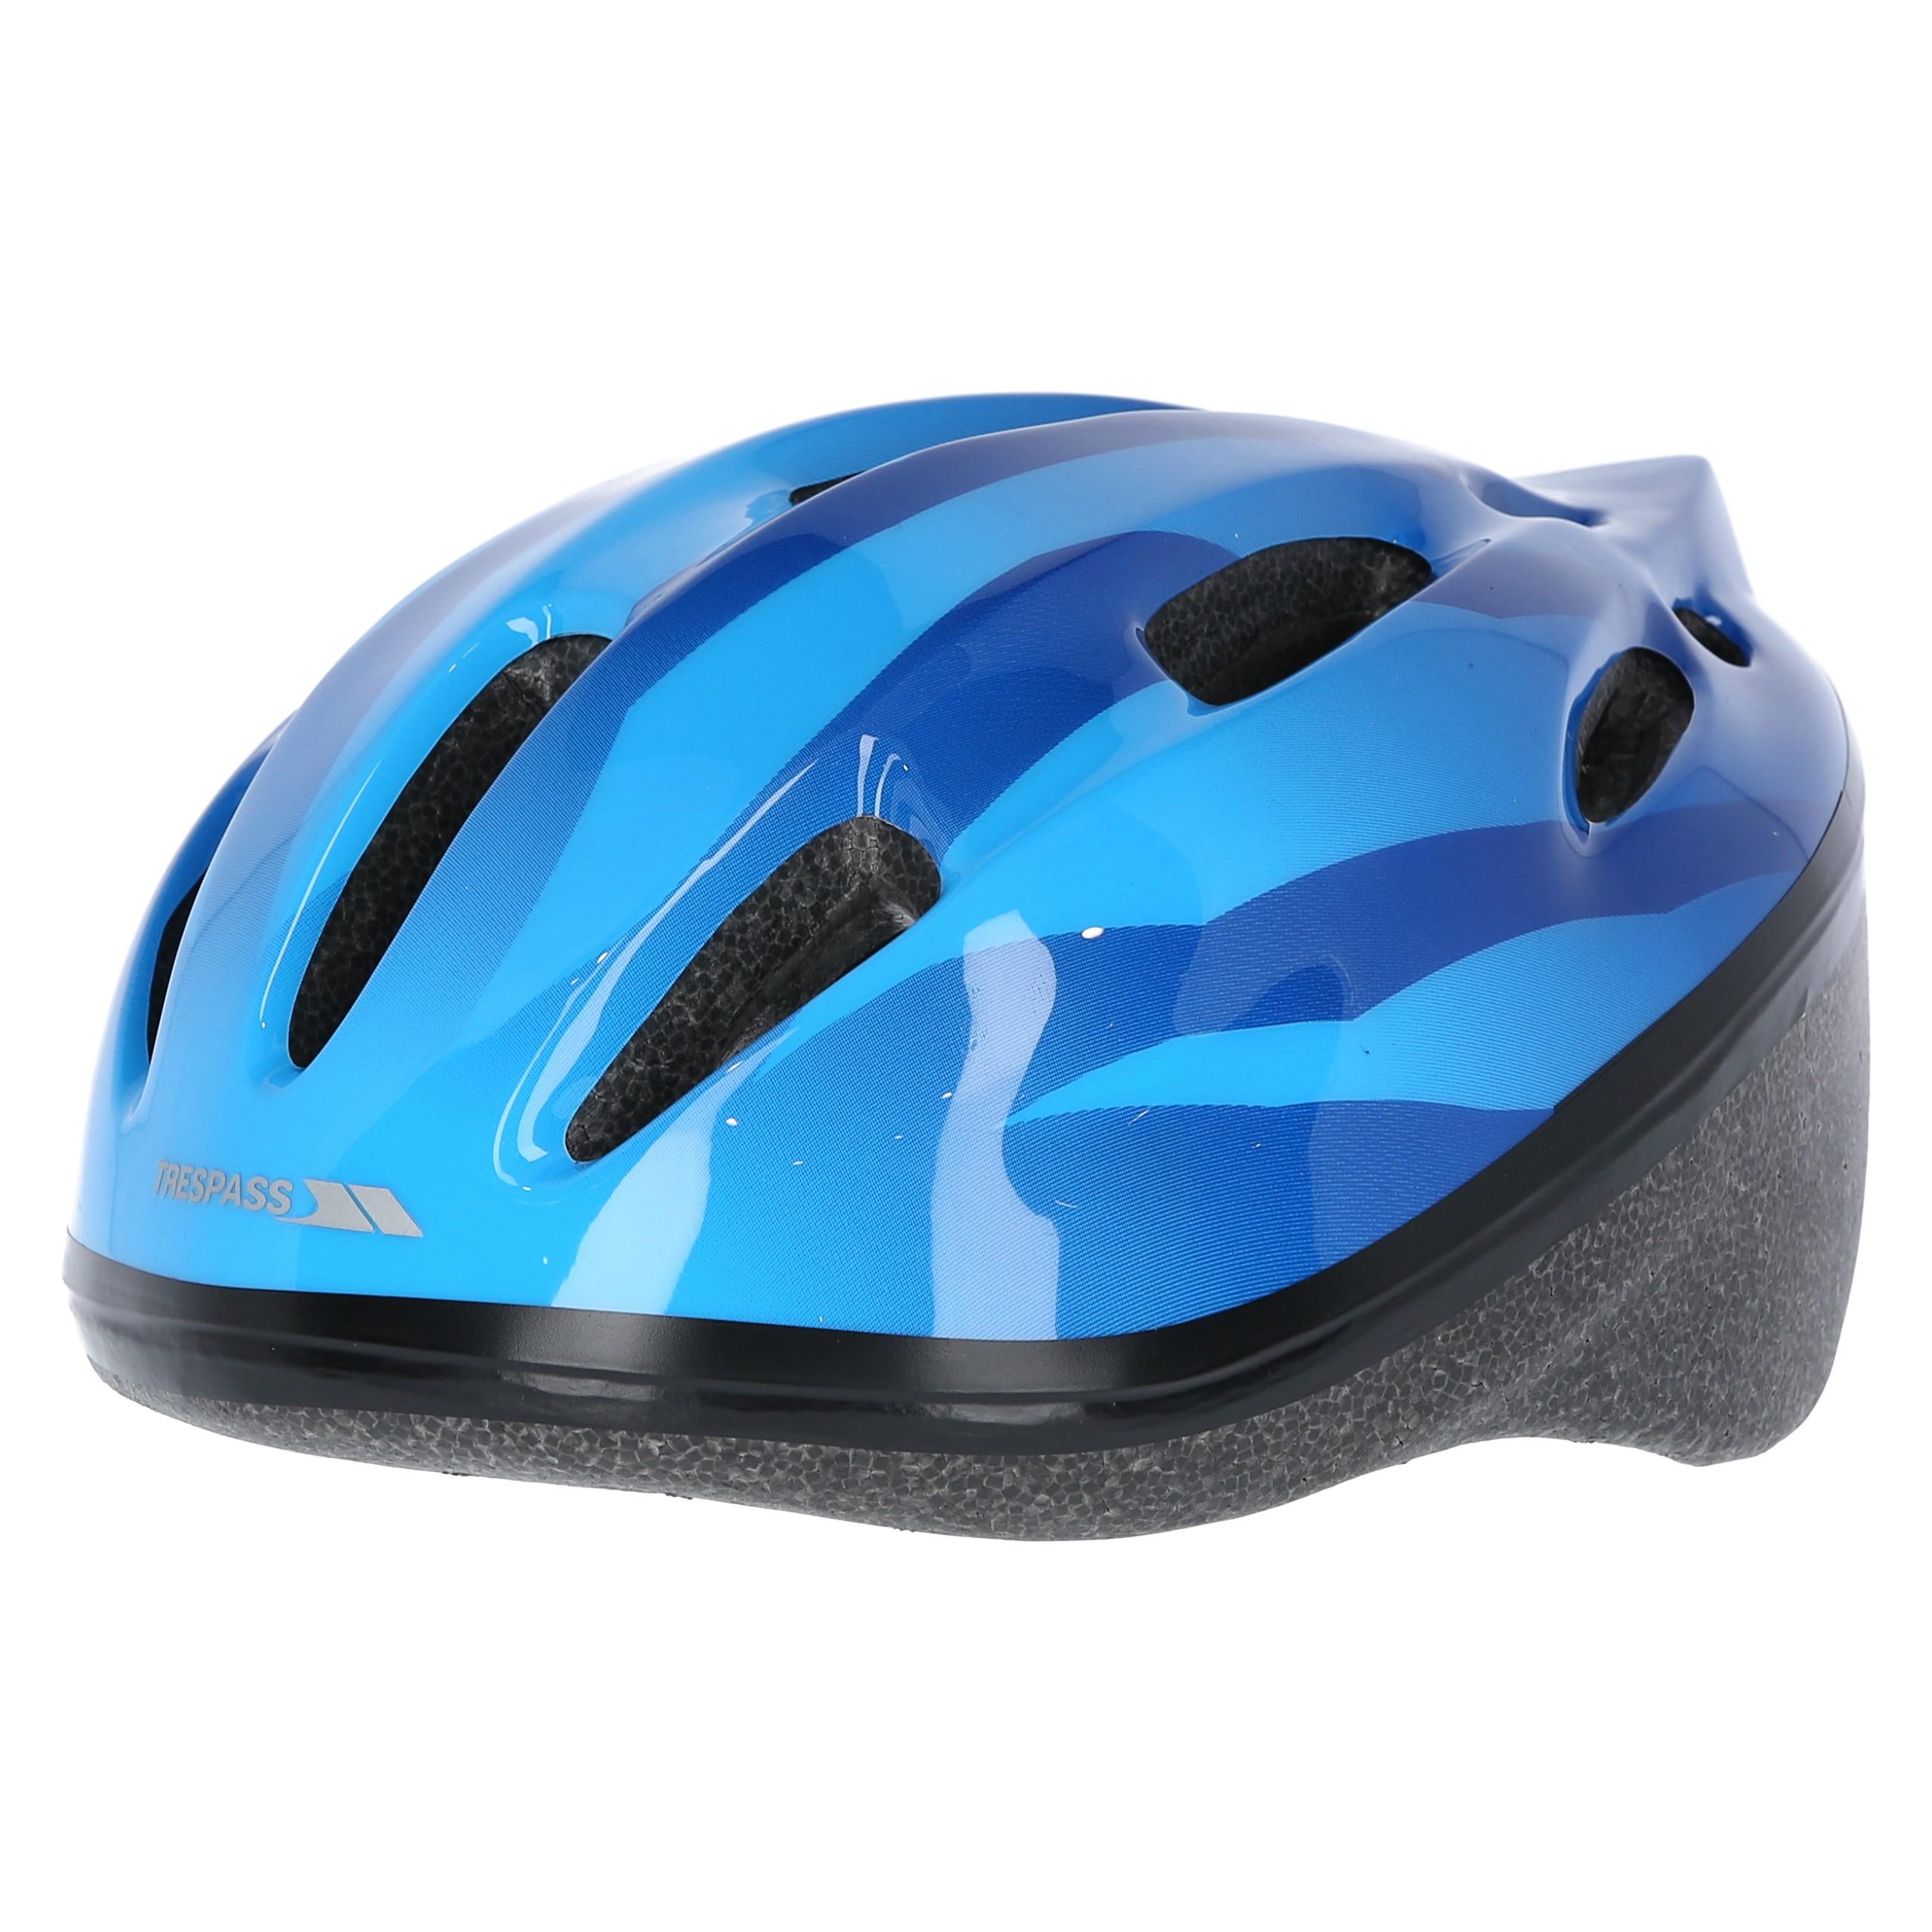 Trespass Childrens//Kids Tanky Cycling Safety Helmet